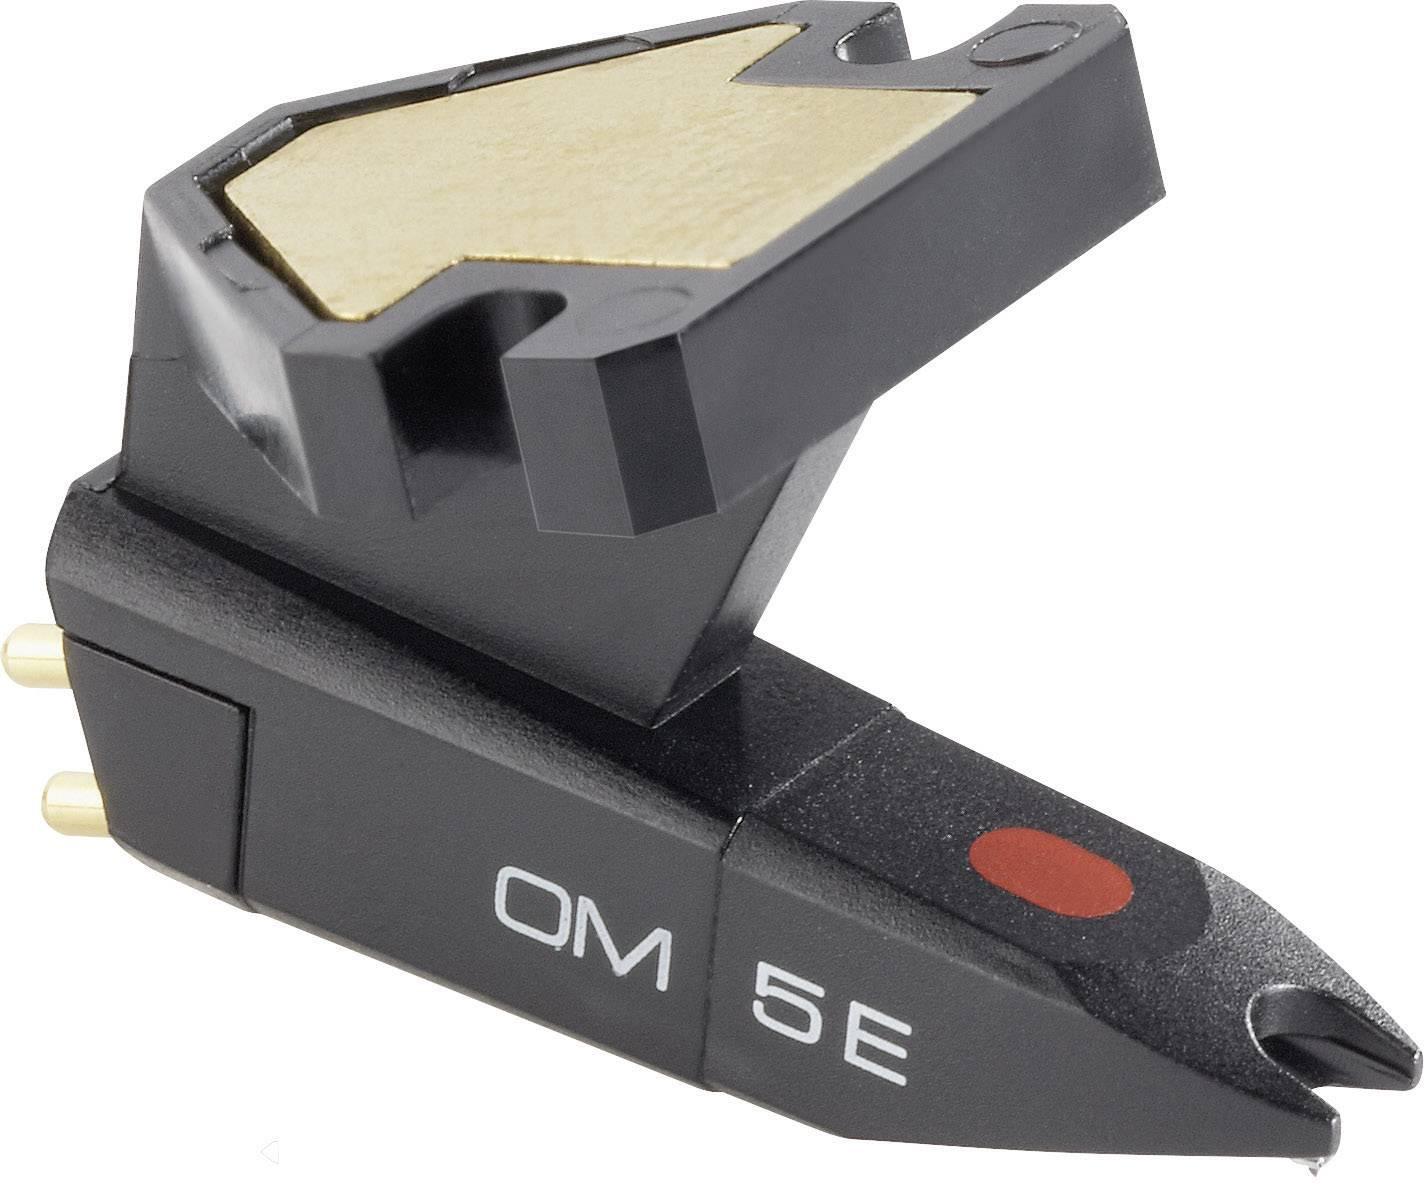 Ortofon OMB 5 E, ihla elipticky brusená